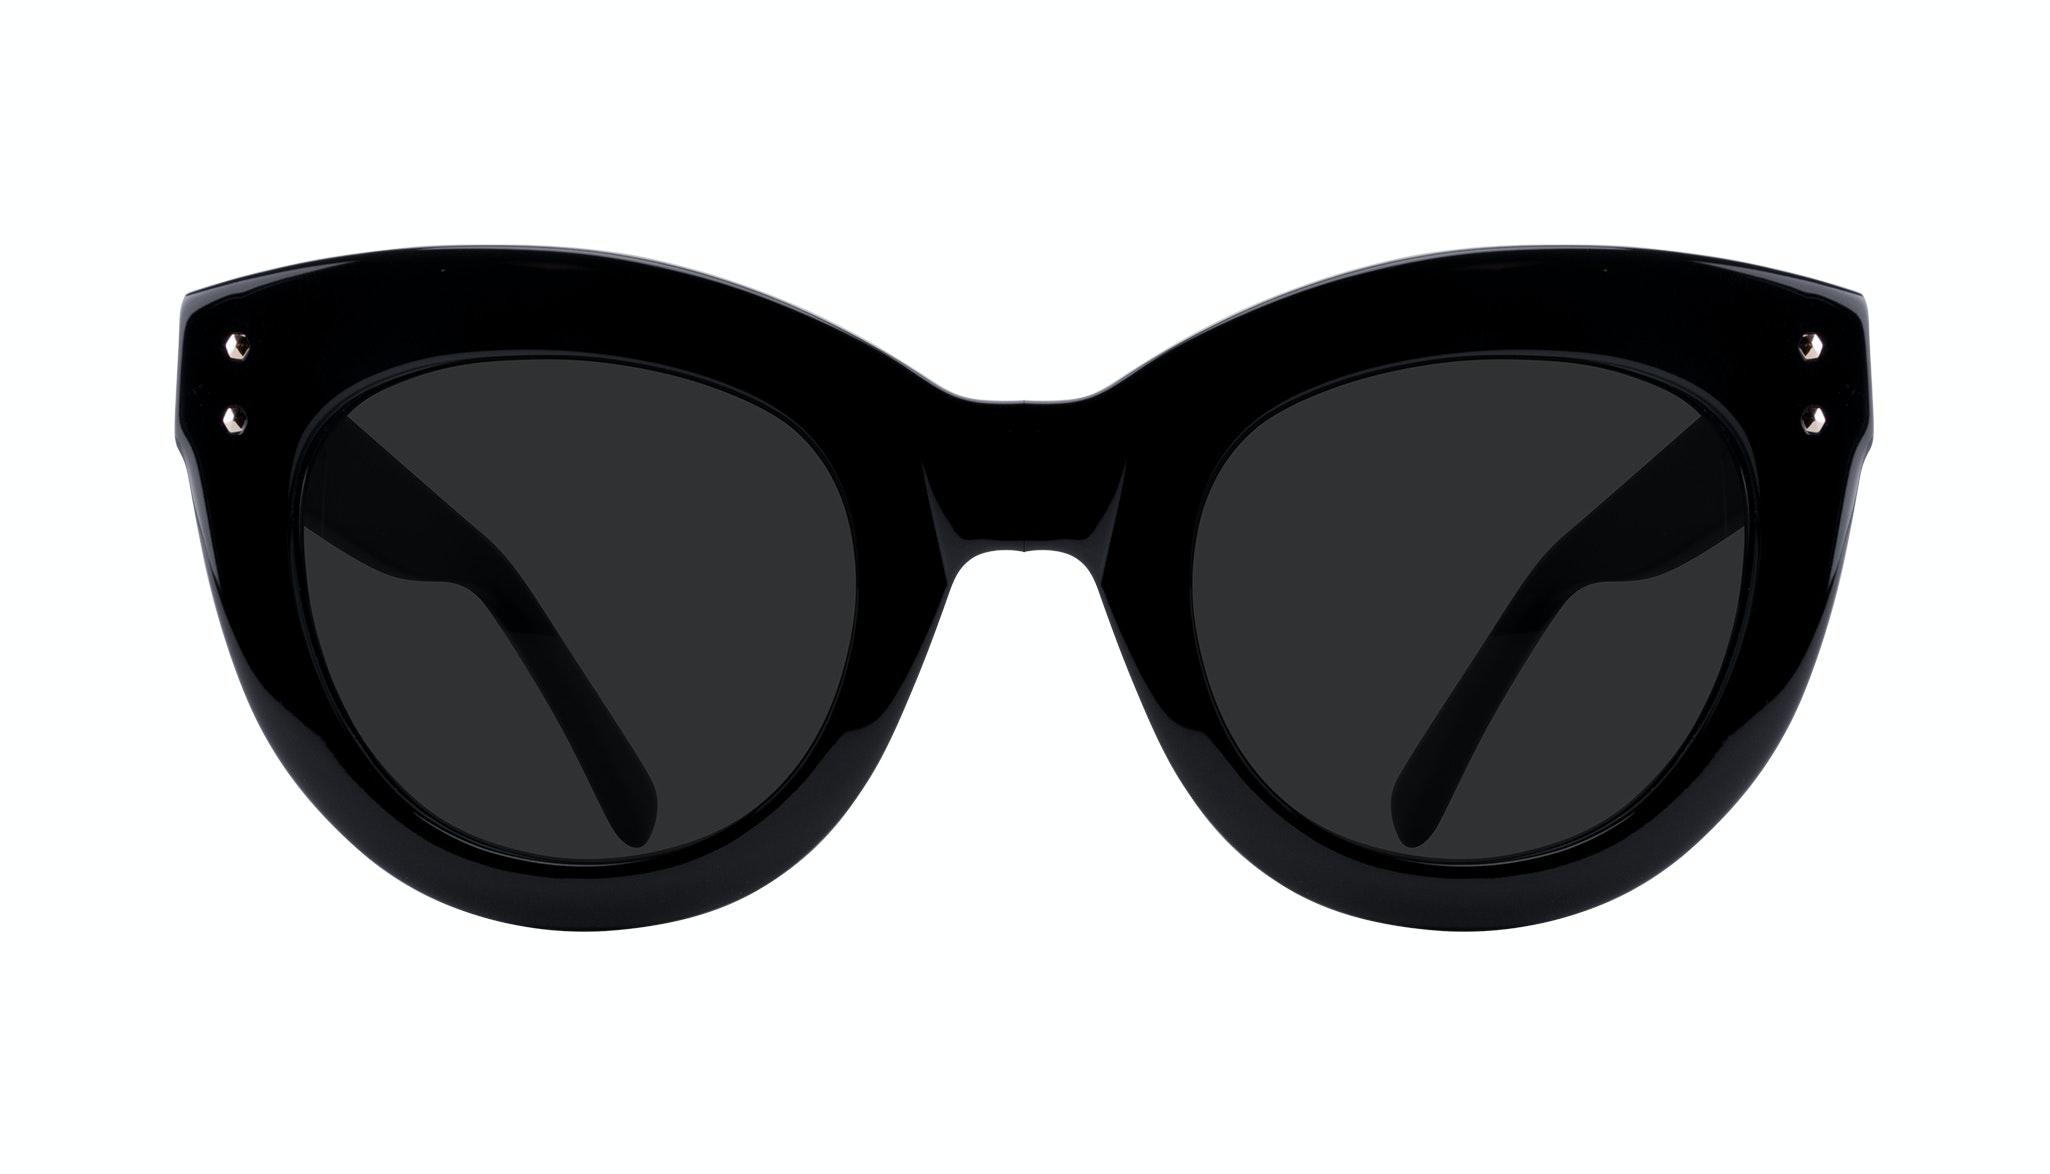 Affordable Fashion Glasses Cat Eye Sunglasses Women Dusk Onyx